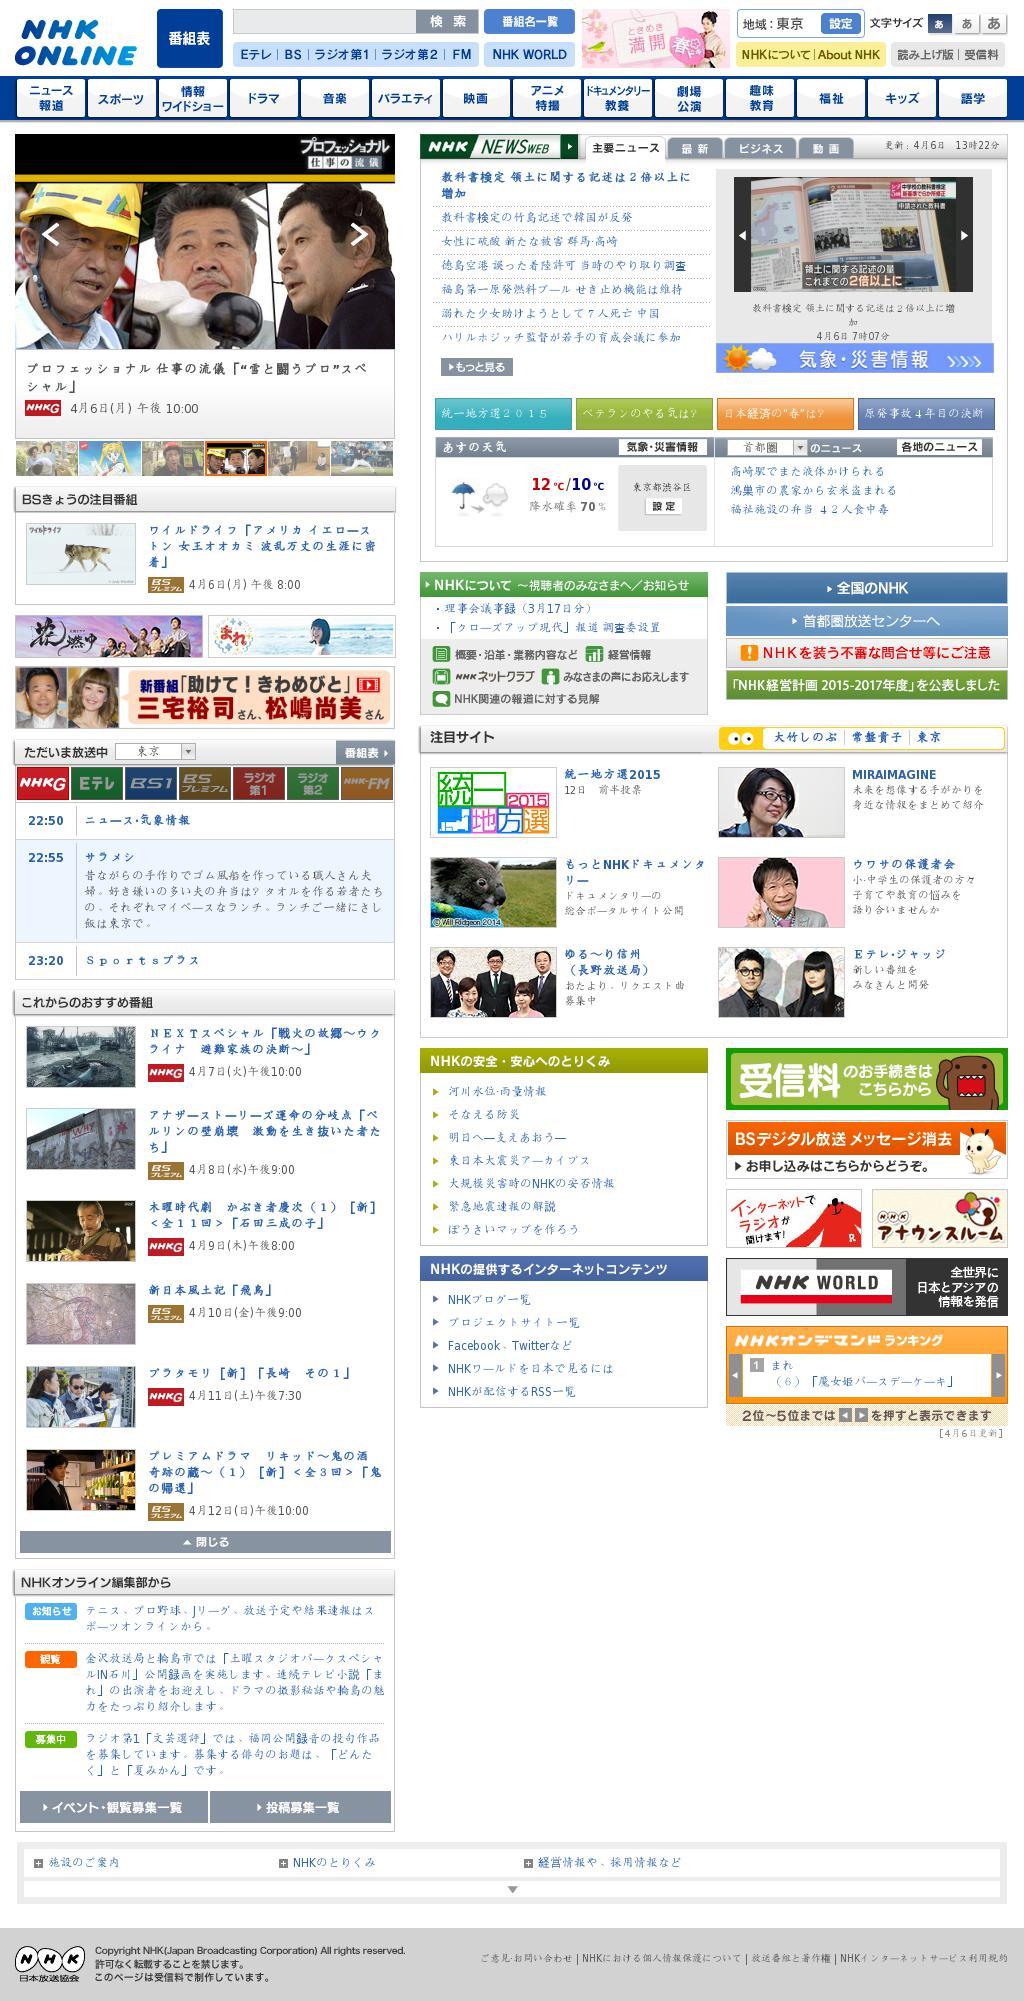 NHK Online at Monday April 6, 2015, 2:14 p.m. UTC